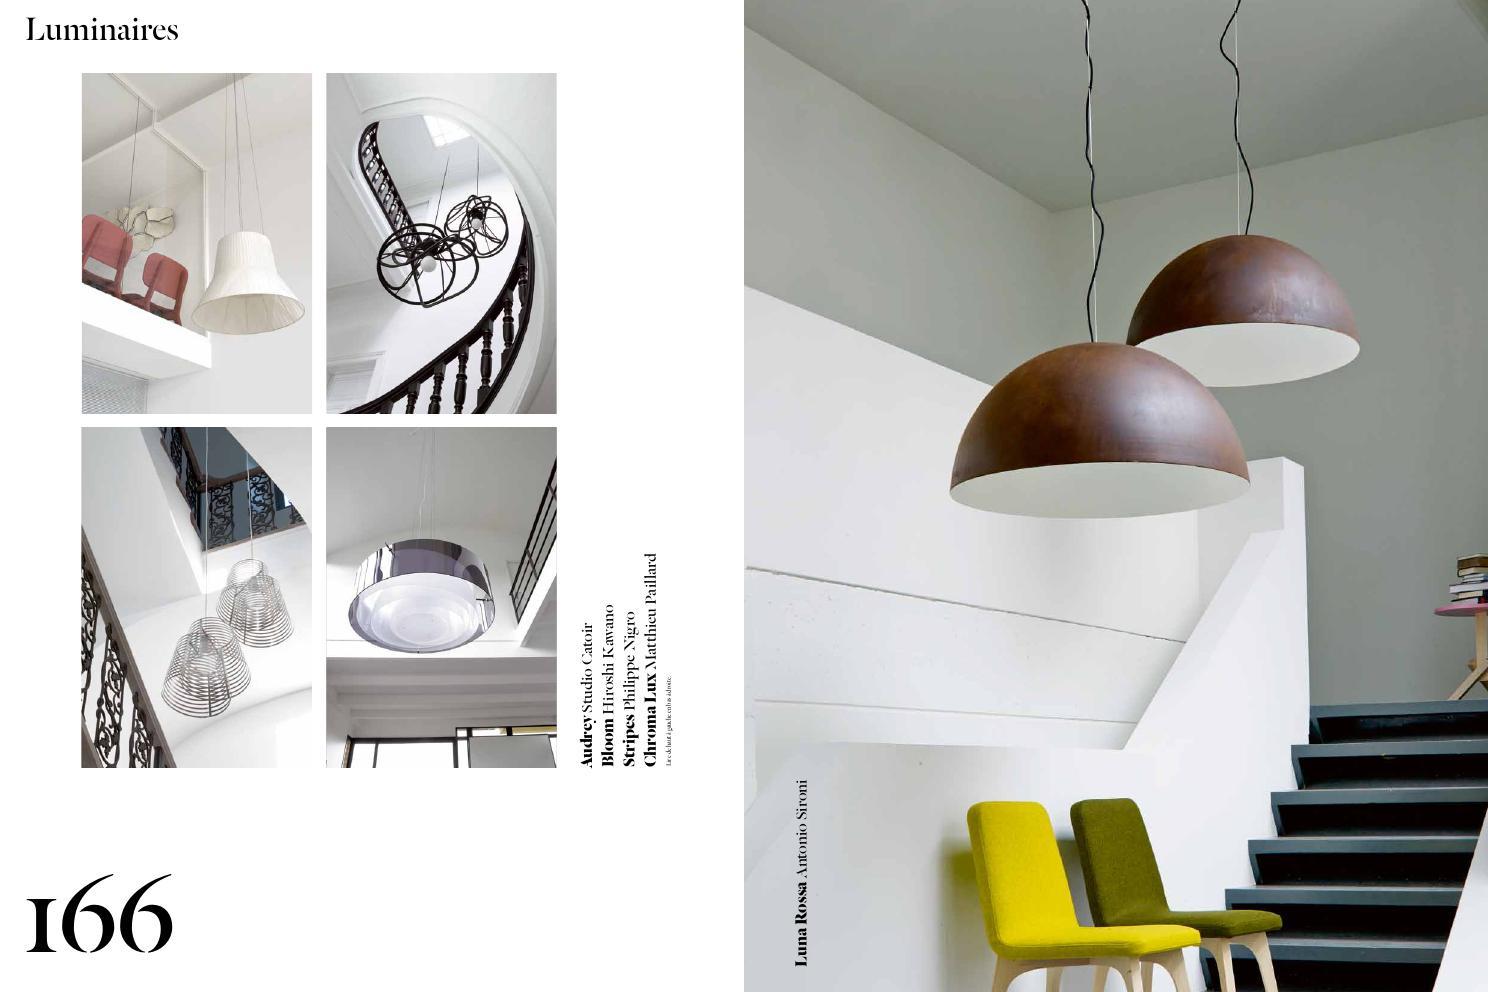 ligne roset catalogue 2014 by joe monroe issuu. Black Bedroom Furniture Sets. Home Design Ideas